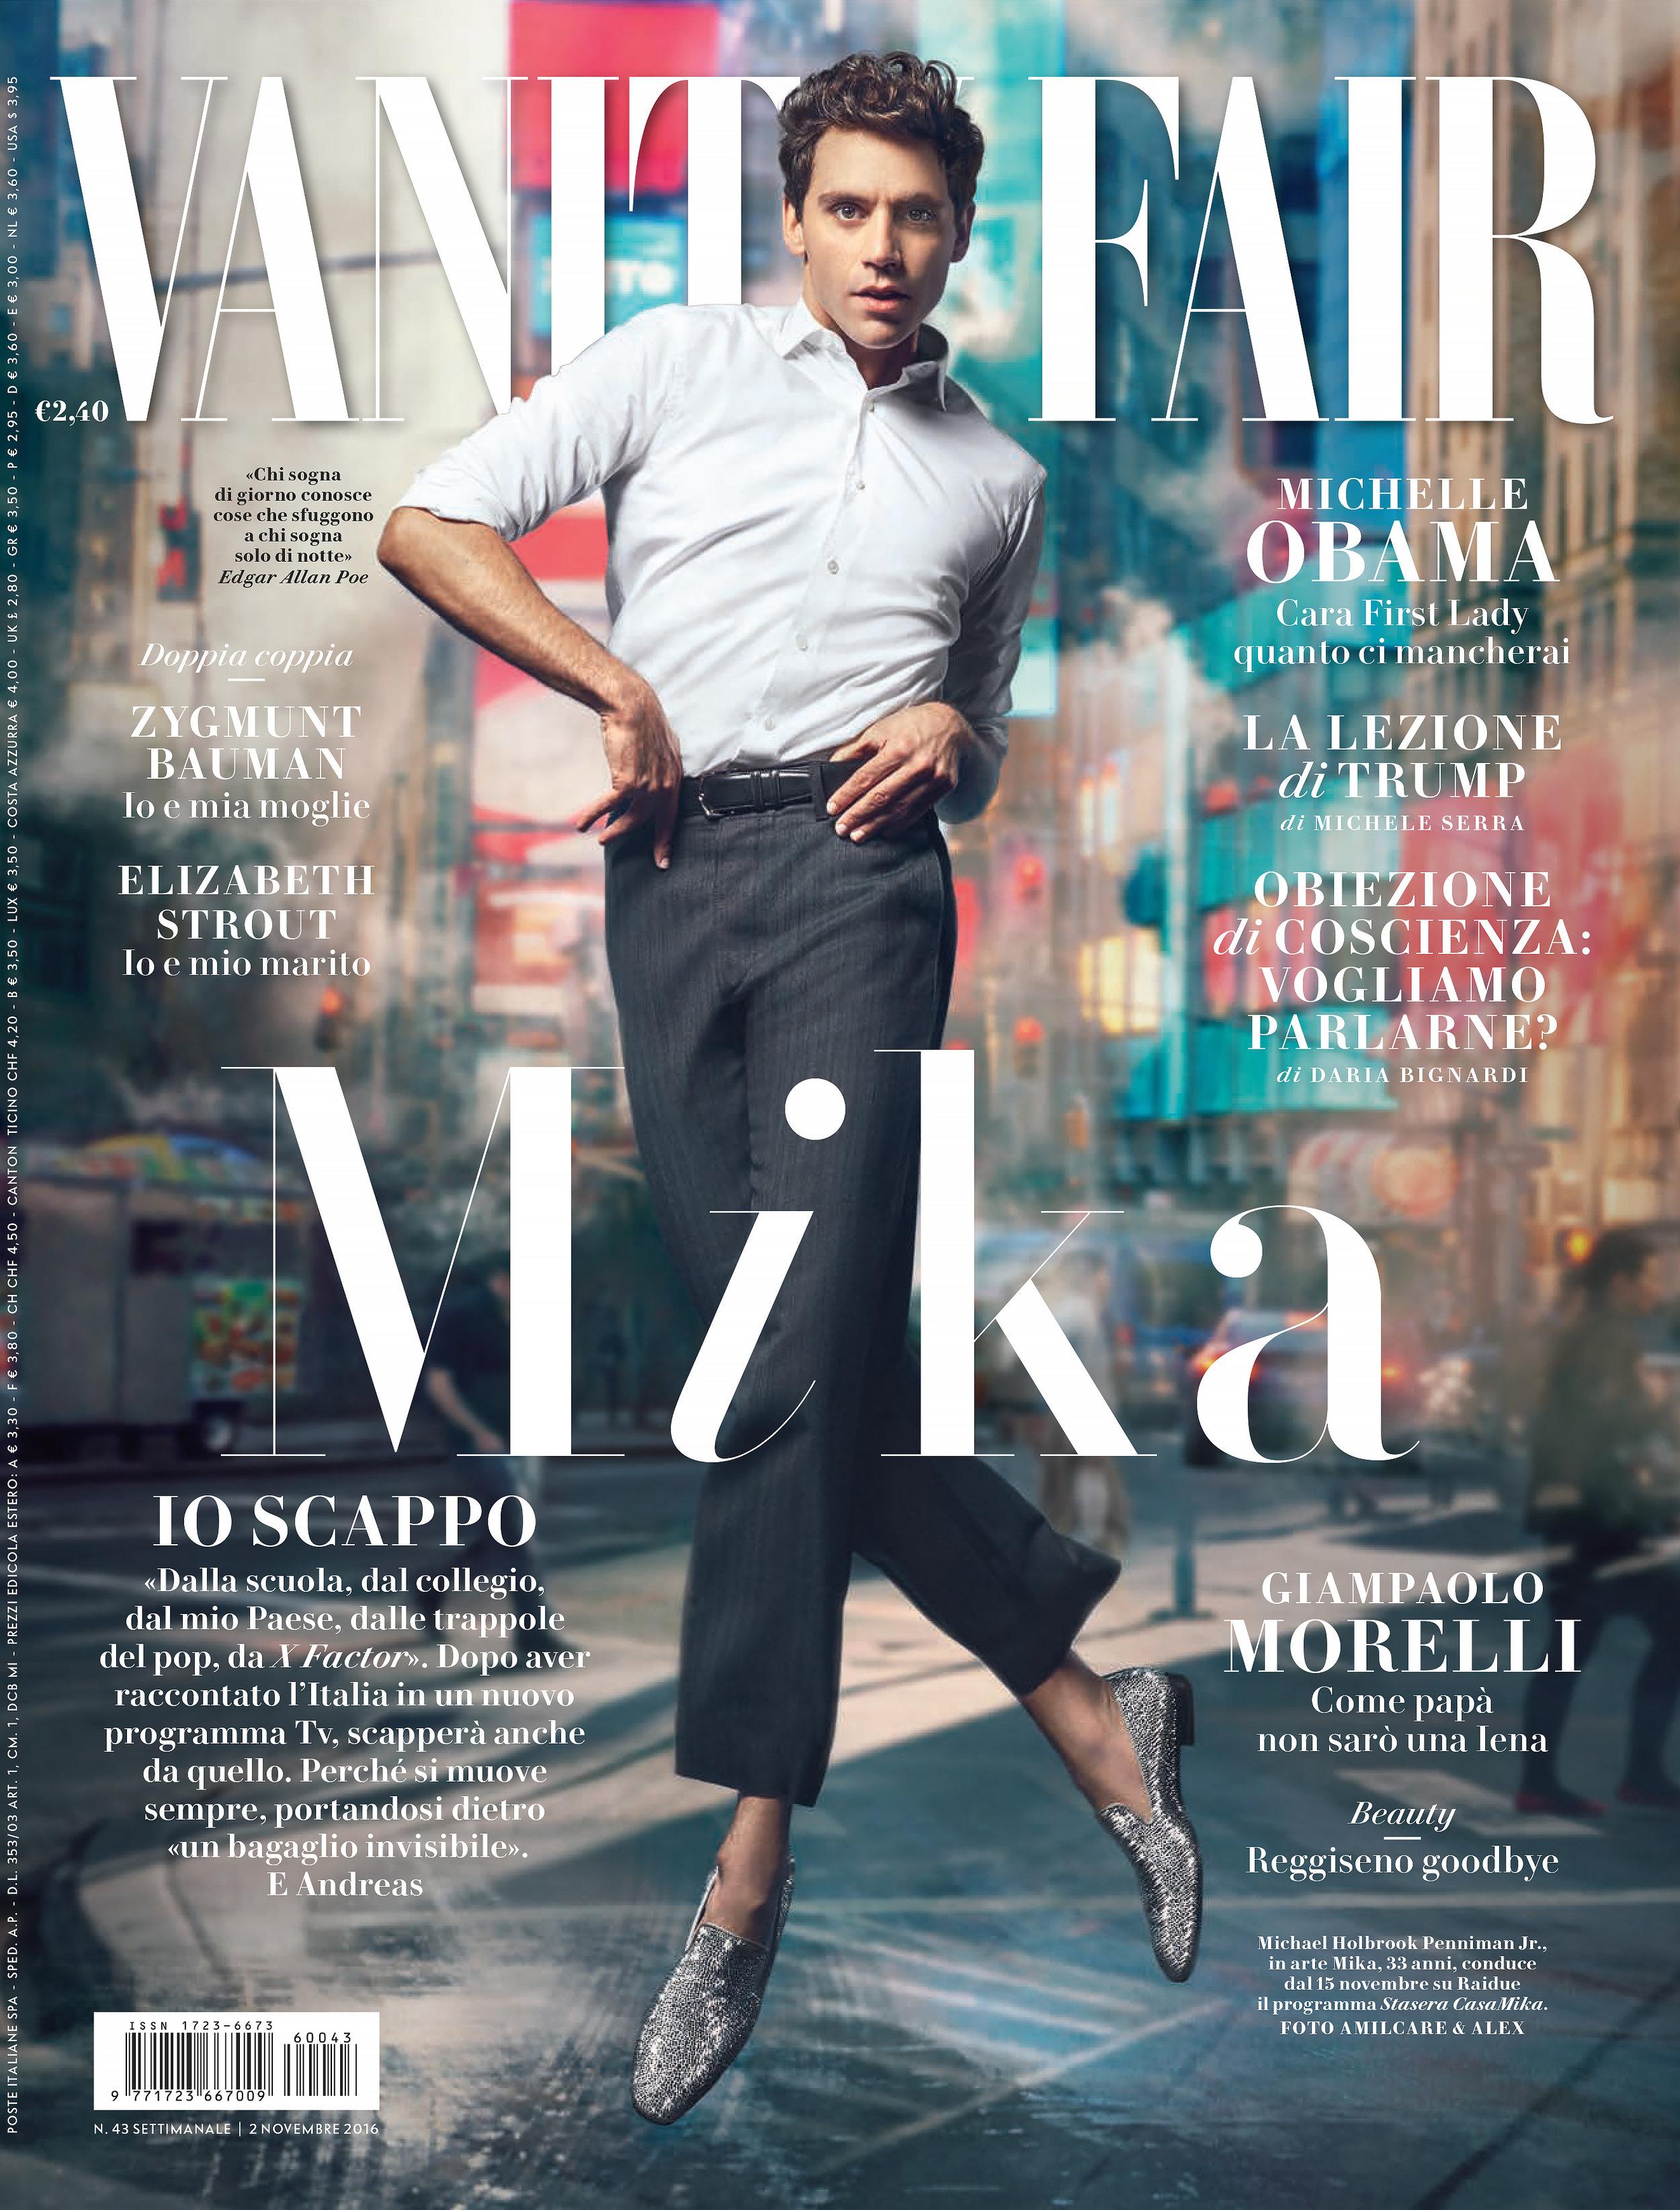 Mika16-1-B.jpg